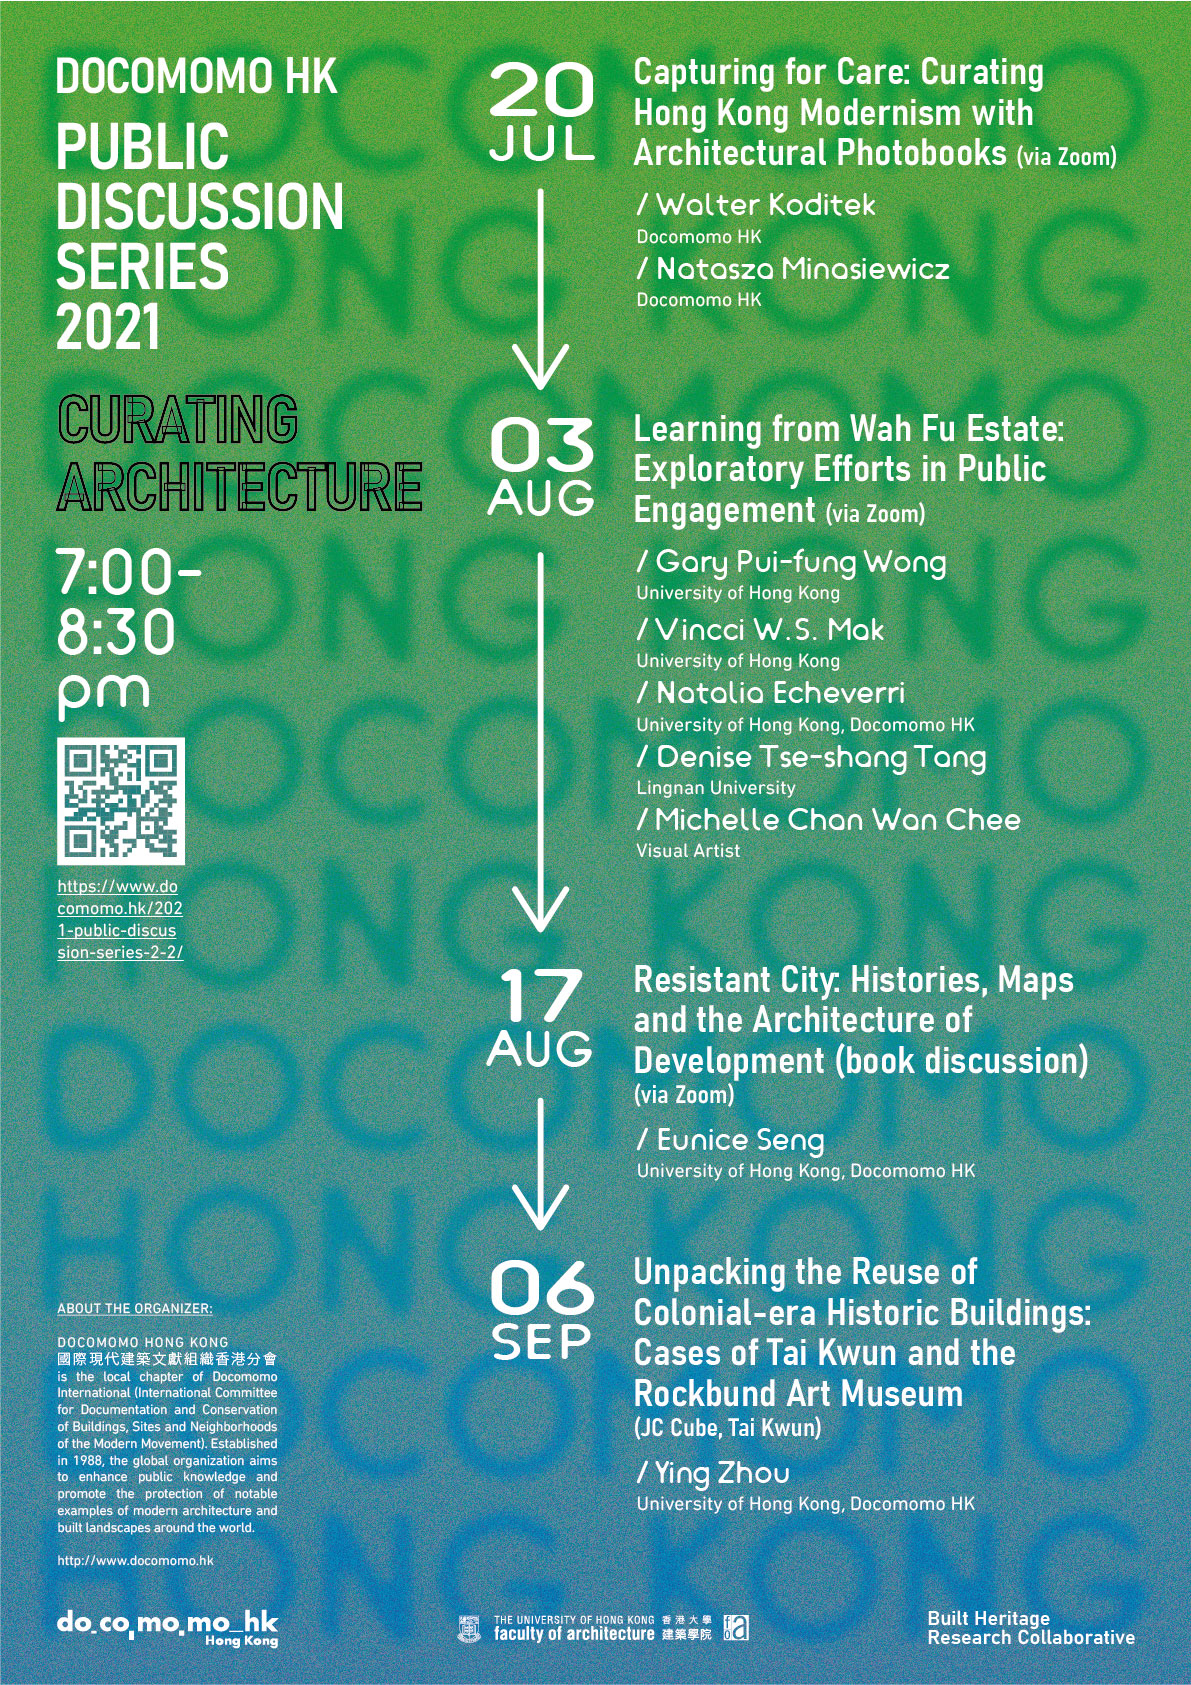 Docomomo Hong Kong 2021 Public Discussion Series (July – September)